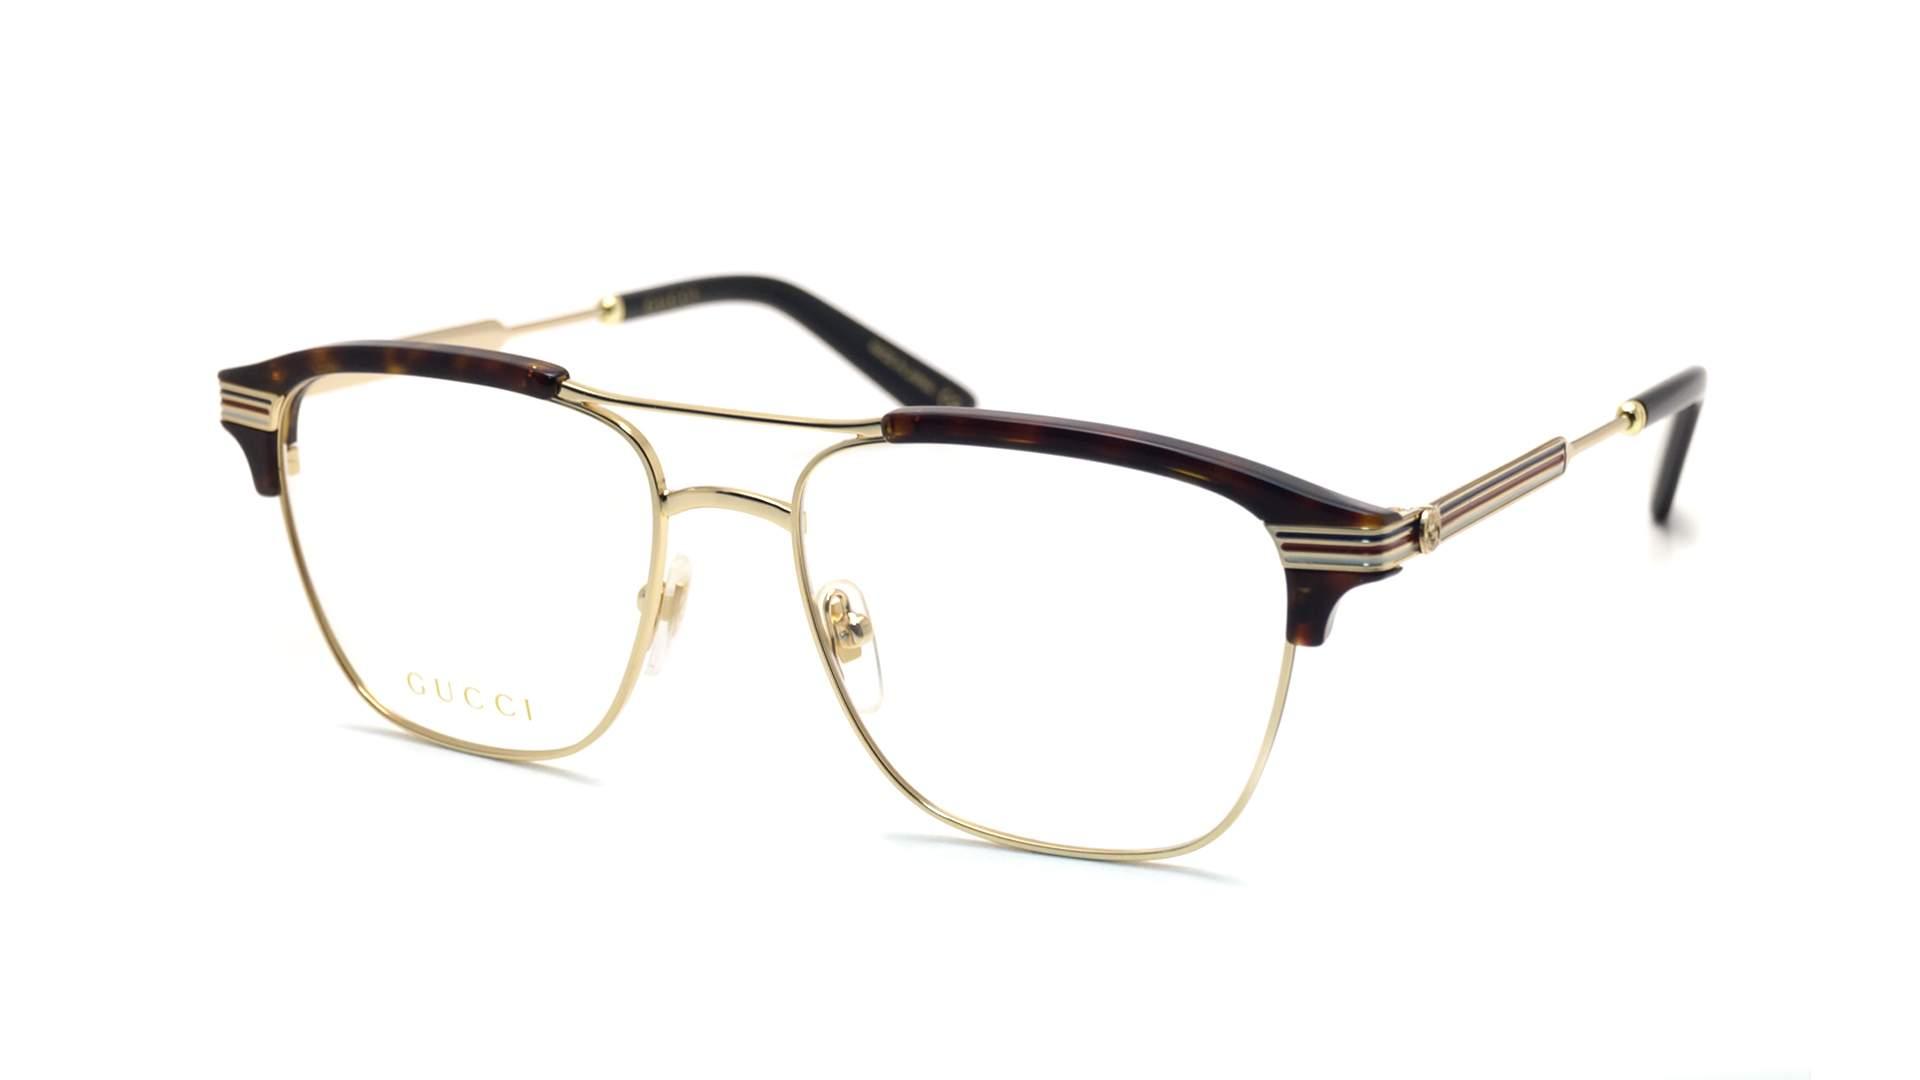 dc28be6f60 Eyeglasses Gucci GG0241O 003 54-17 Gold Medium